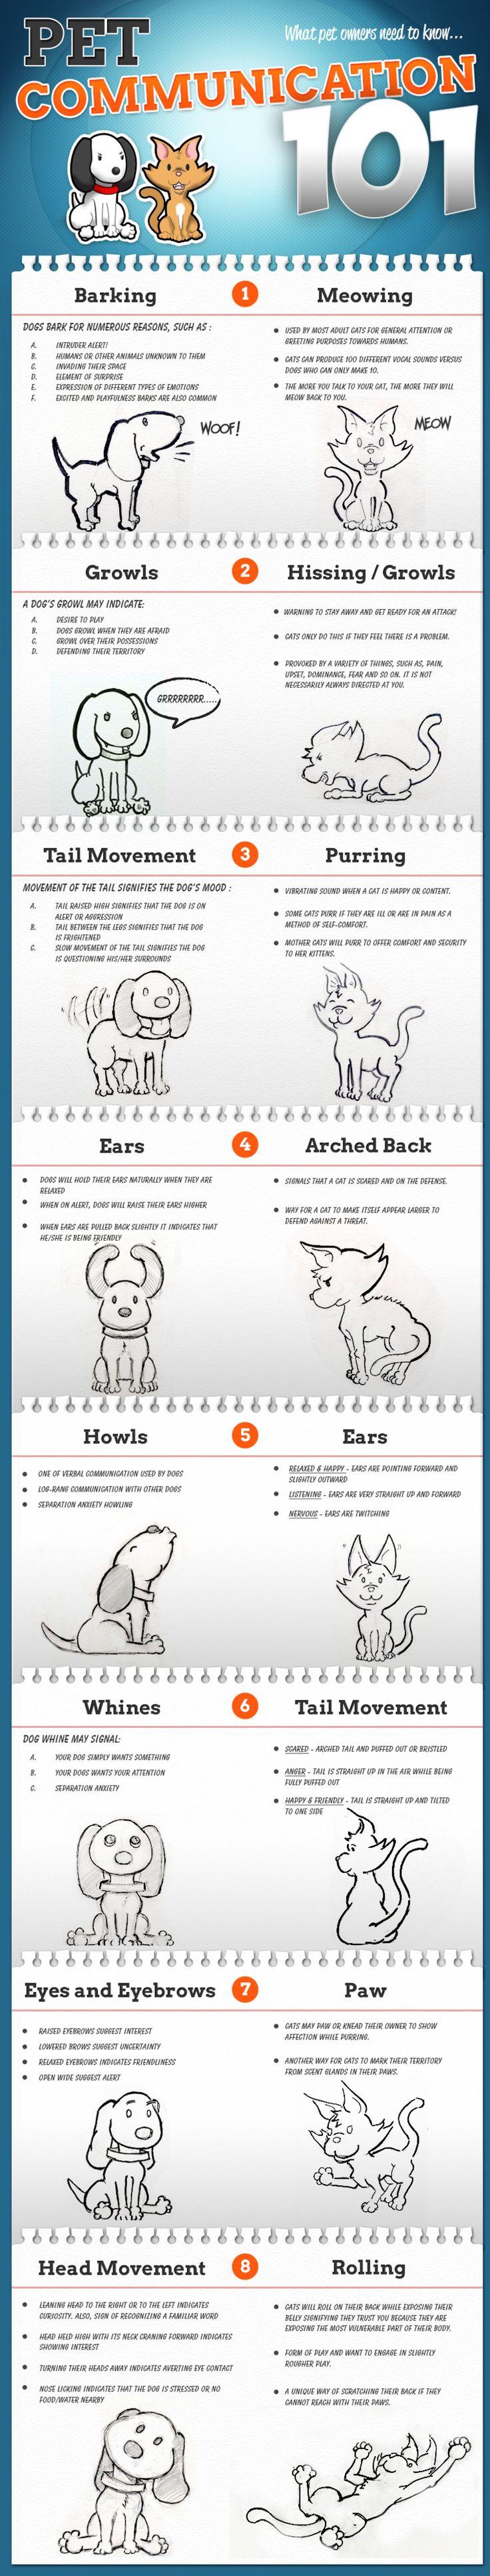 Pet Communication Infographic